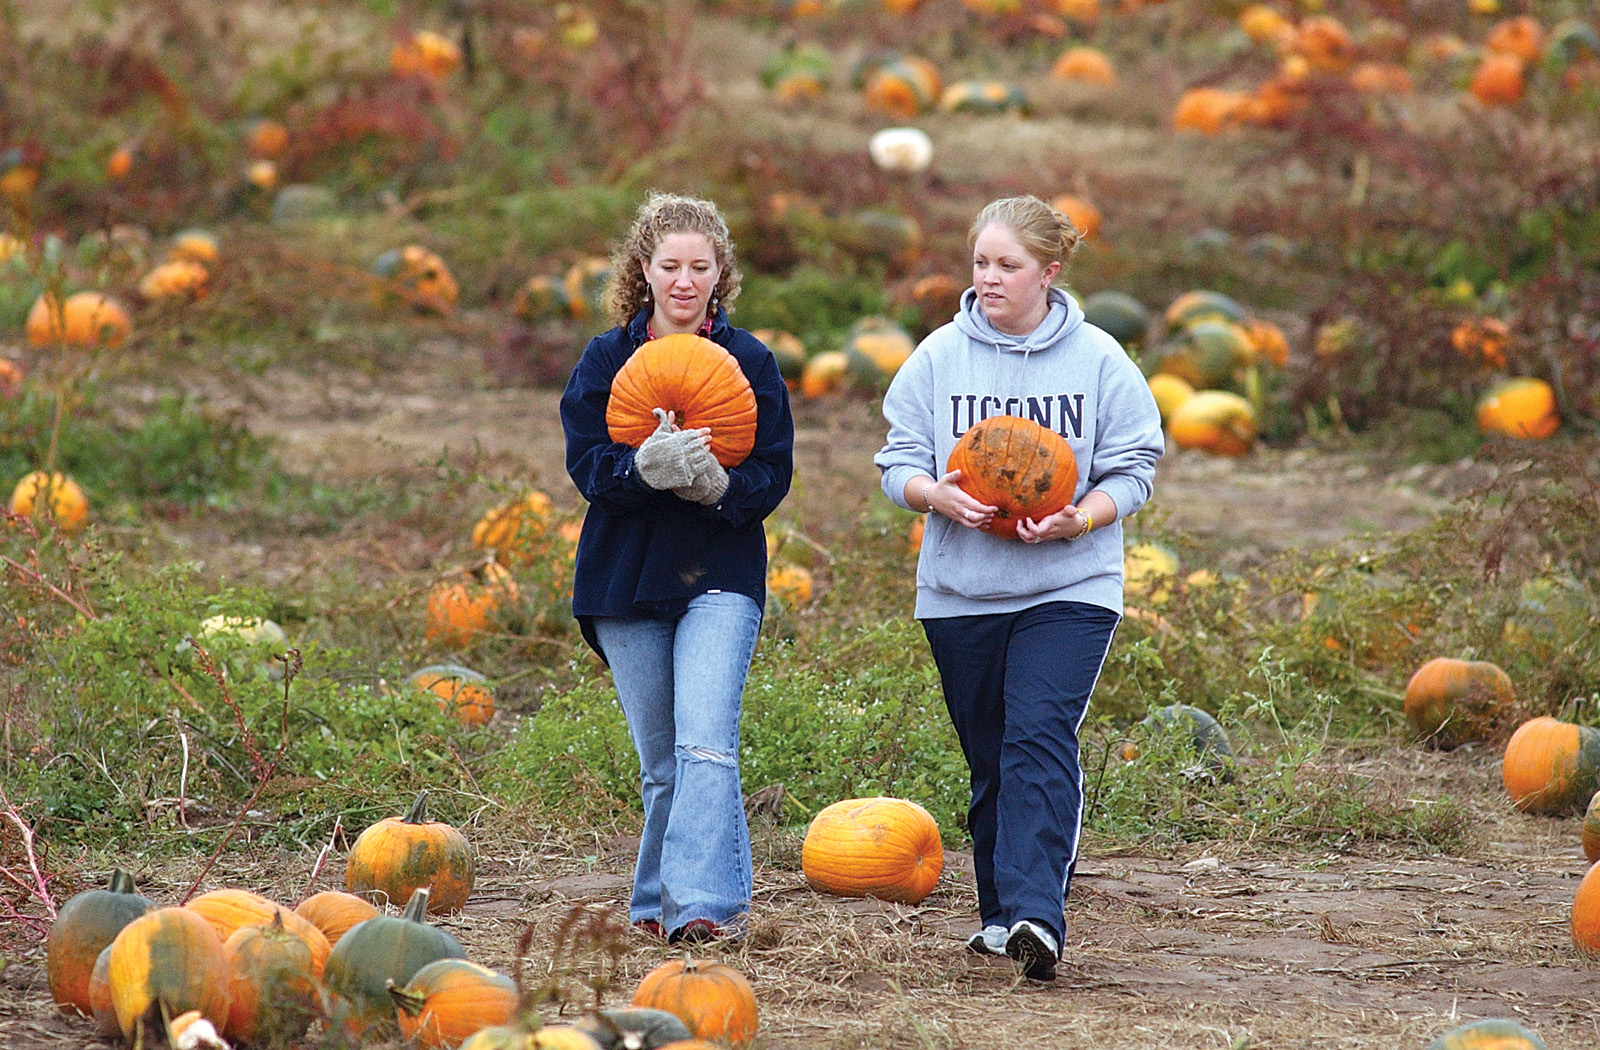 Reader's Digest names best pumpkin patch in CT